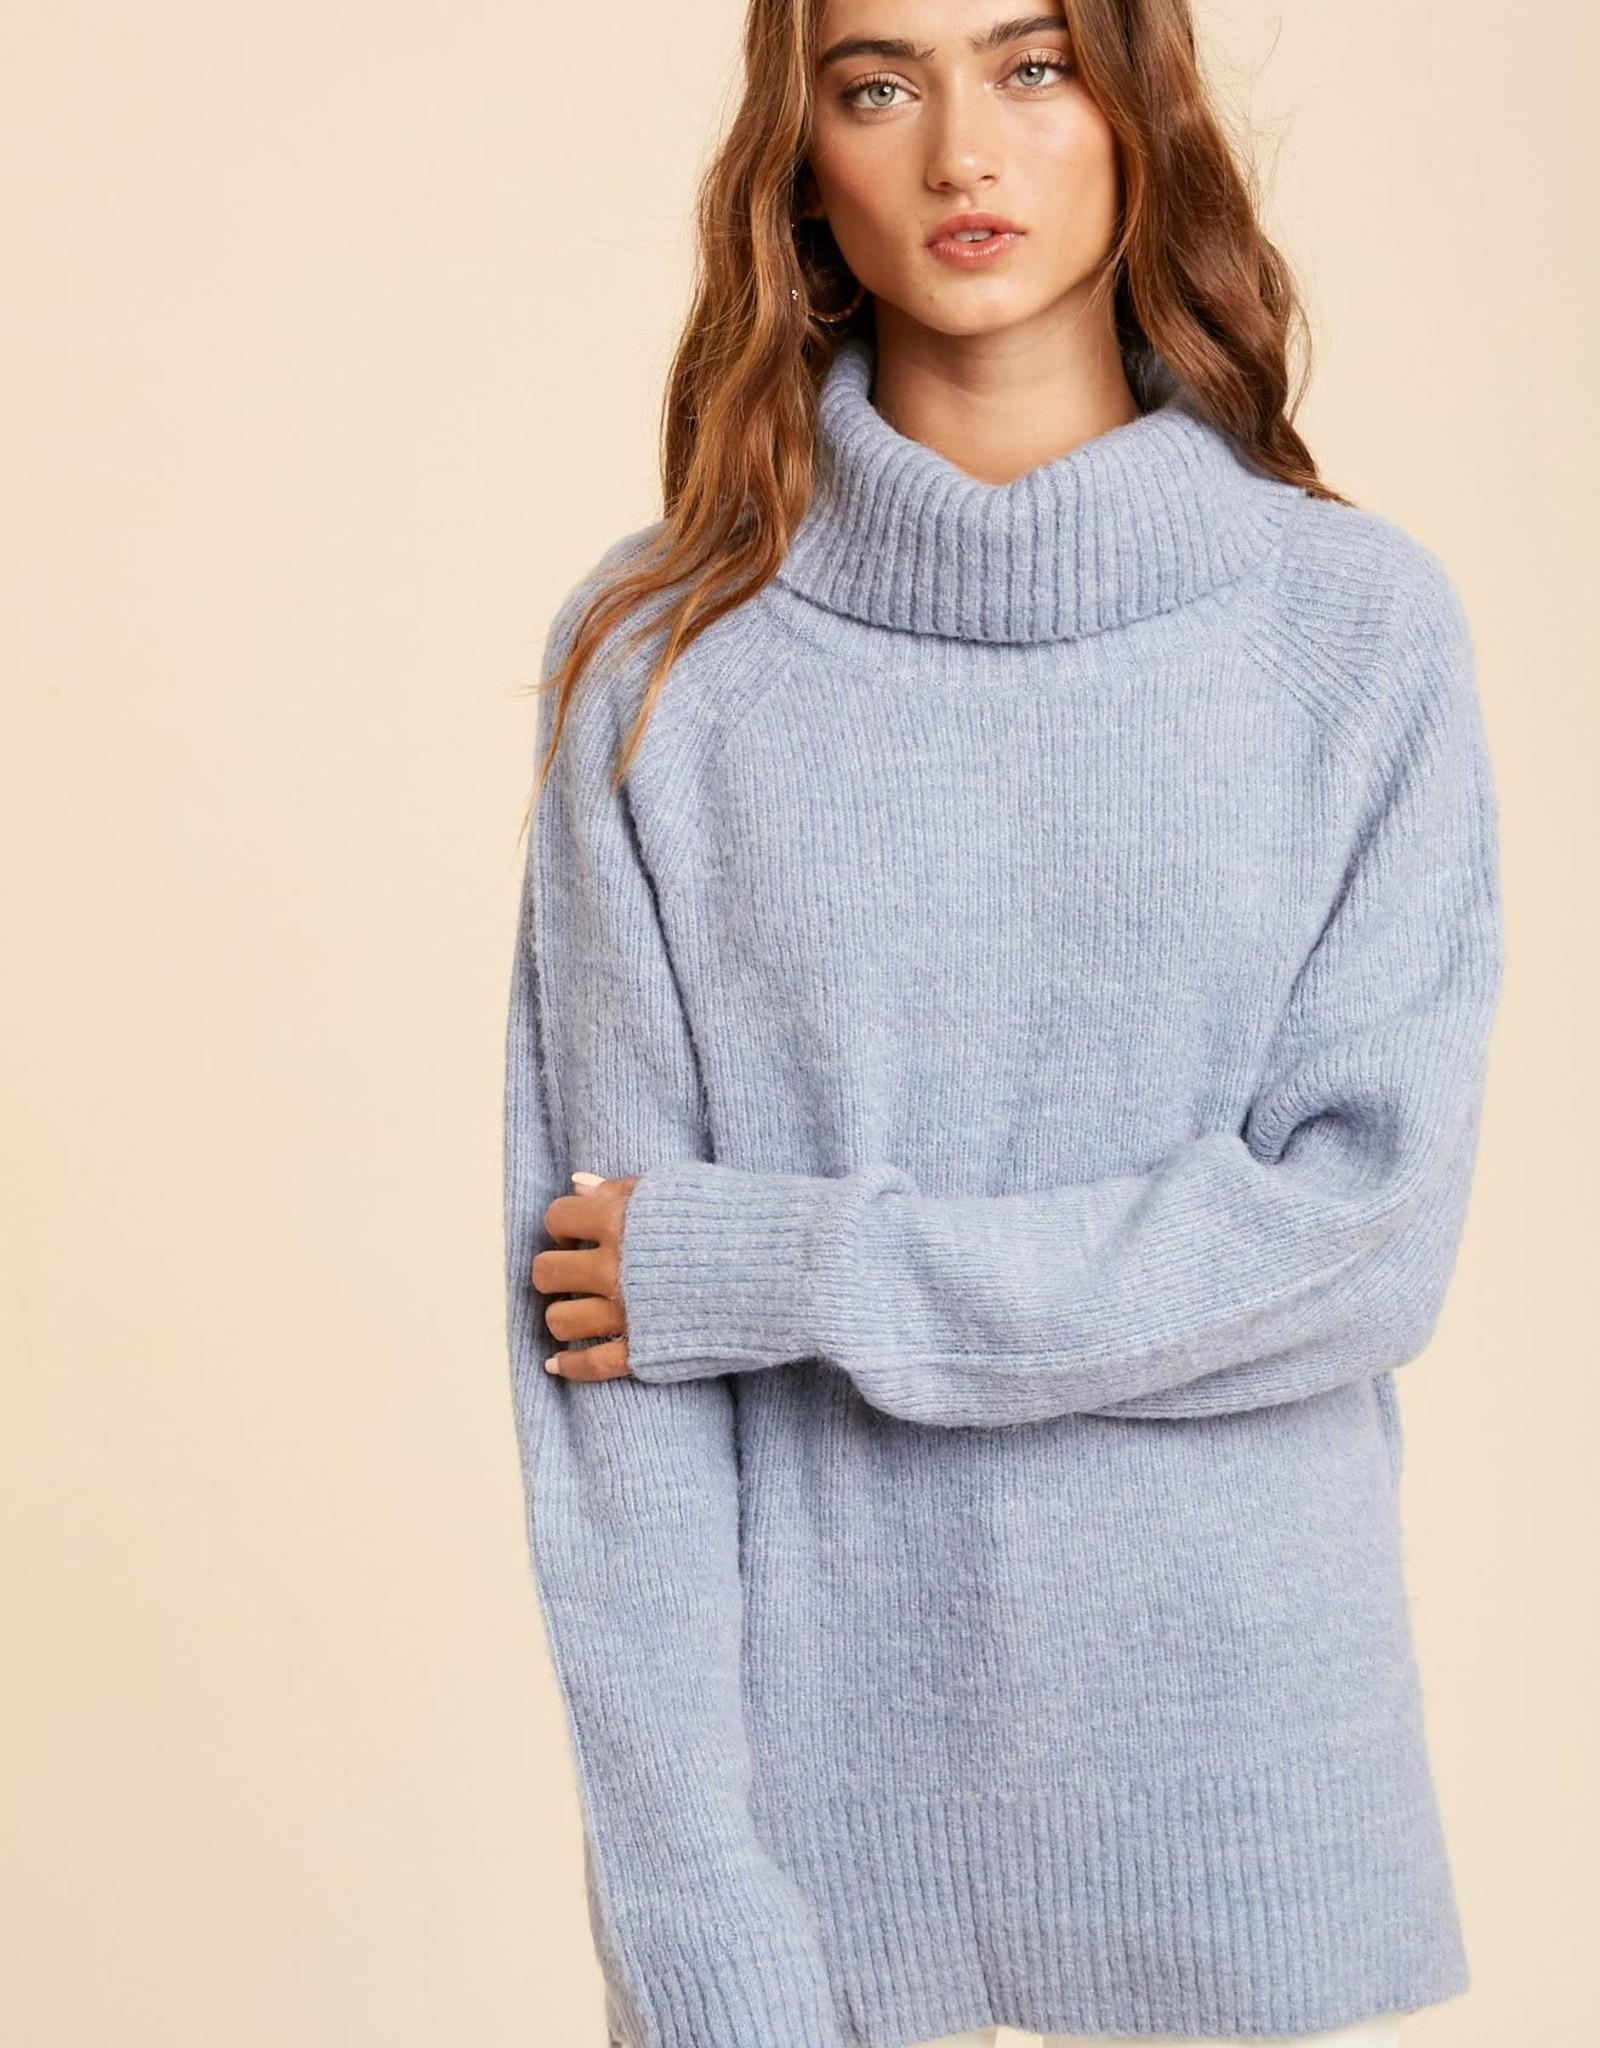 Miss Bliss Knit LS Turtleneck Sweater-